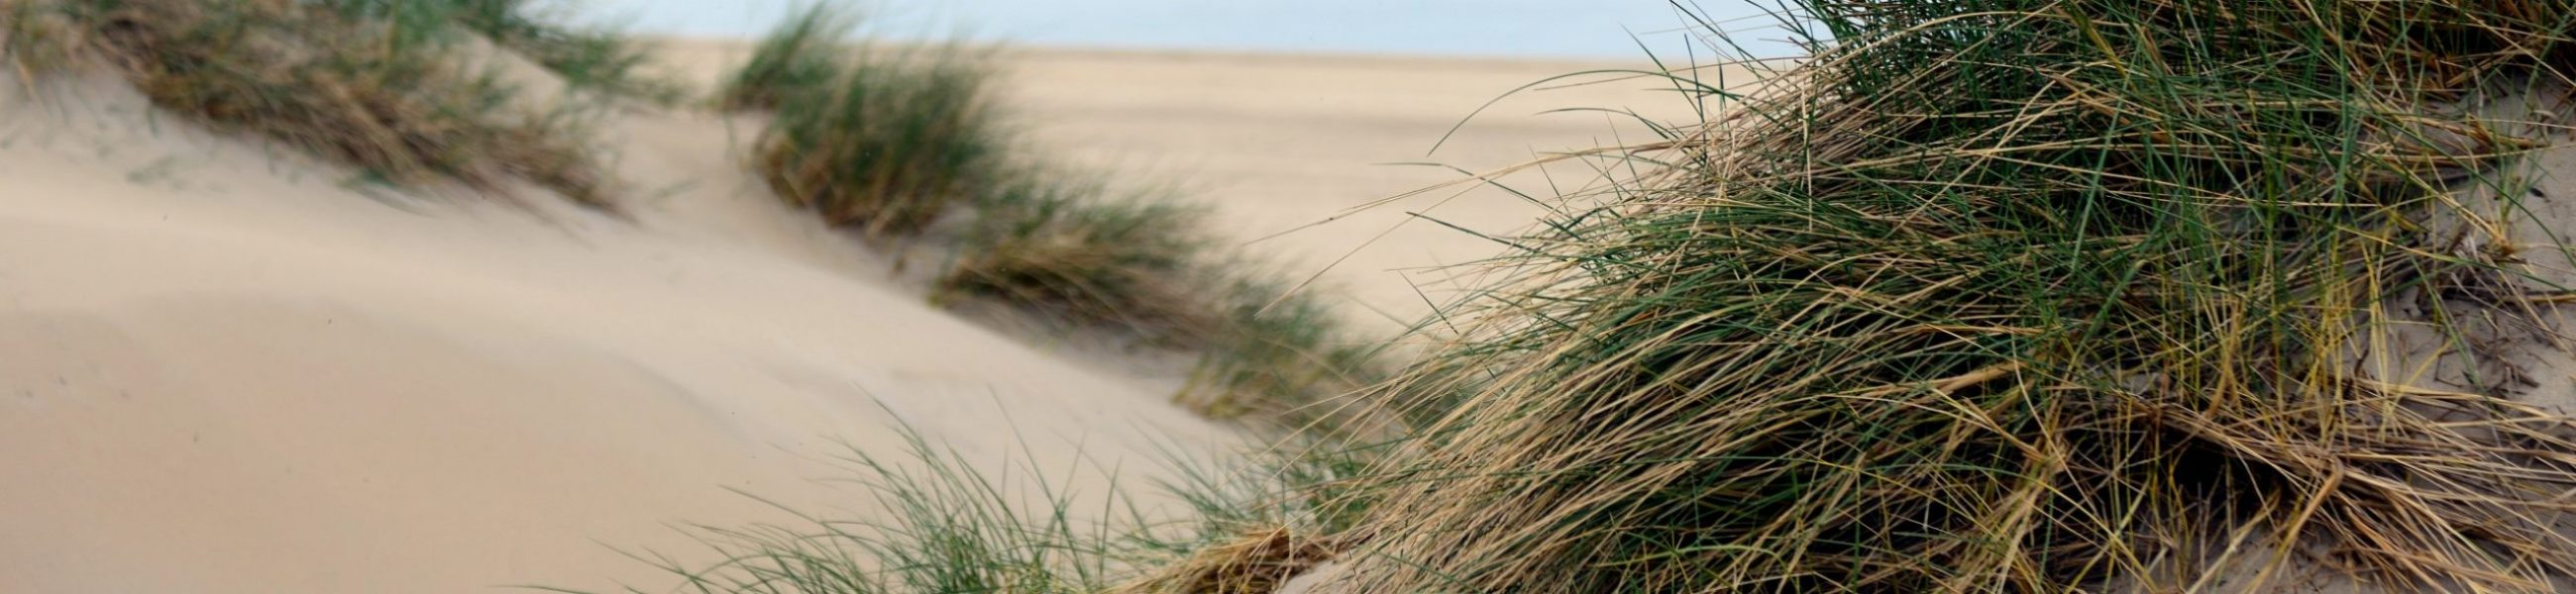 dunes-4752591